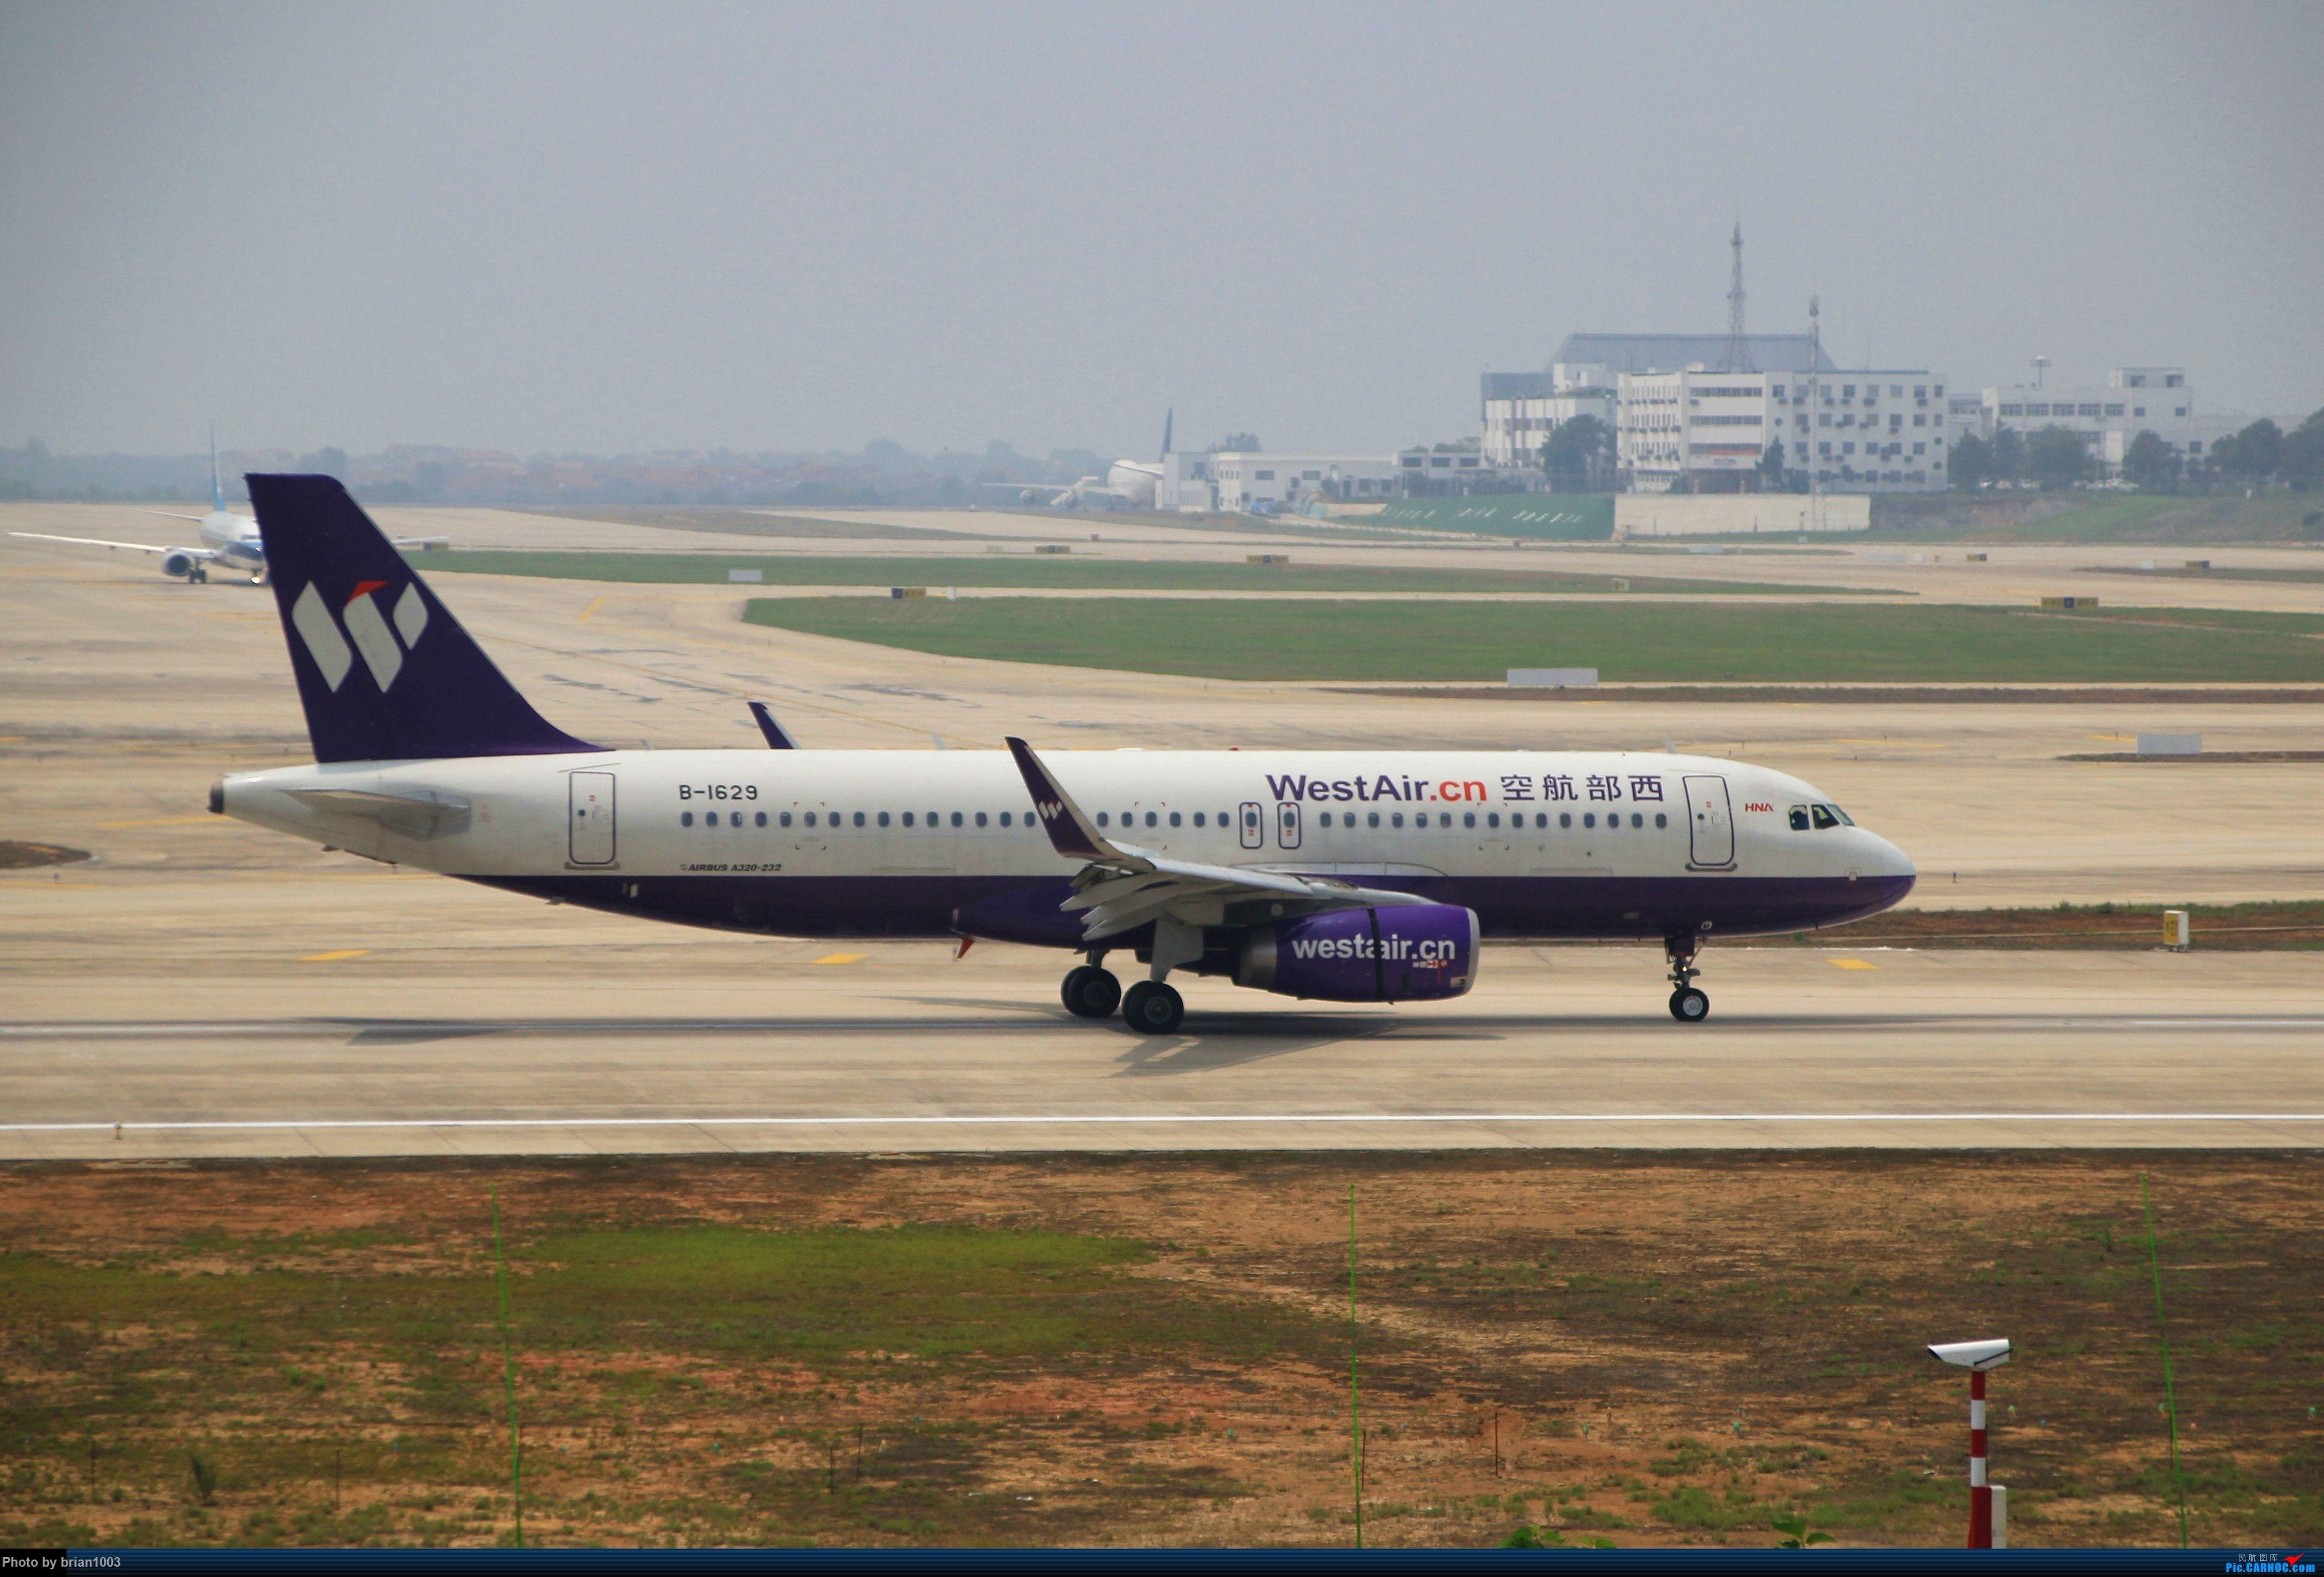 Re:[原创]WUH武汉天河机场拍机之二跑最后忙碌时 AIRBUS A320-200 B-1629 中国武汉天河国际机场